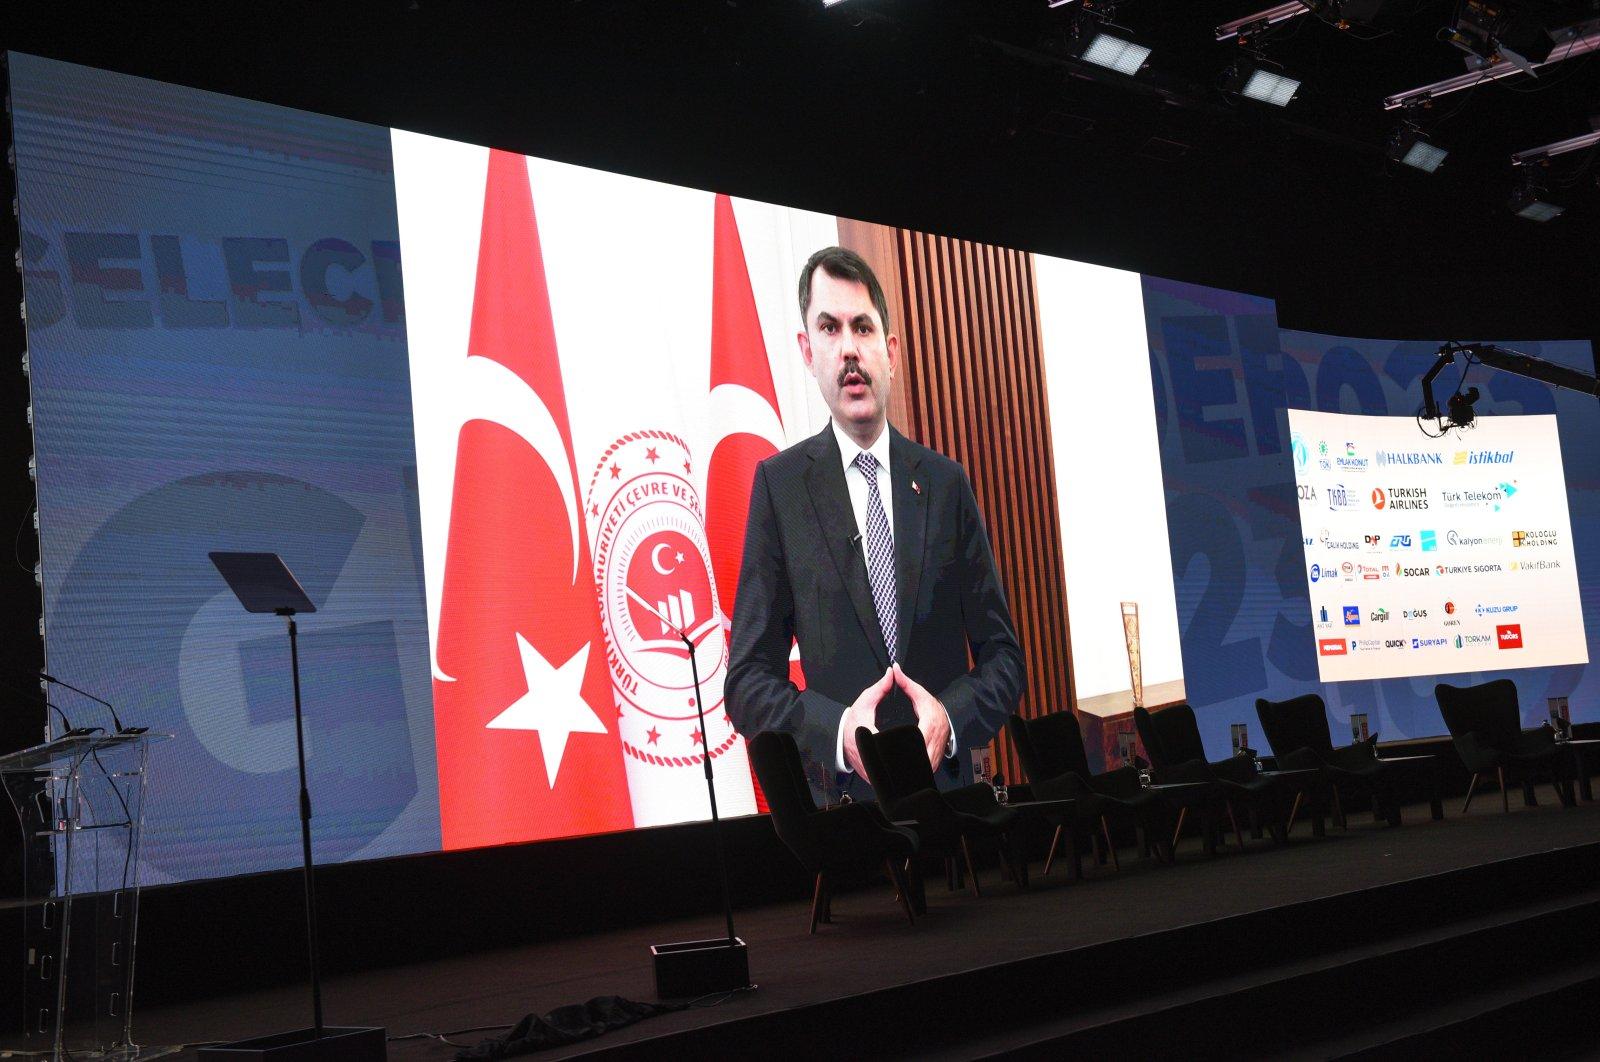 Environment and Urbanization Minister Murat Kurum speaks during the third Turkey 2023 Summit,organized by the Sabah newspaper of Turkuvaz Media Group, in Istanbul, Turkey, Oct. 22, 2020. (Photo by Murat Şengül)